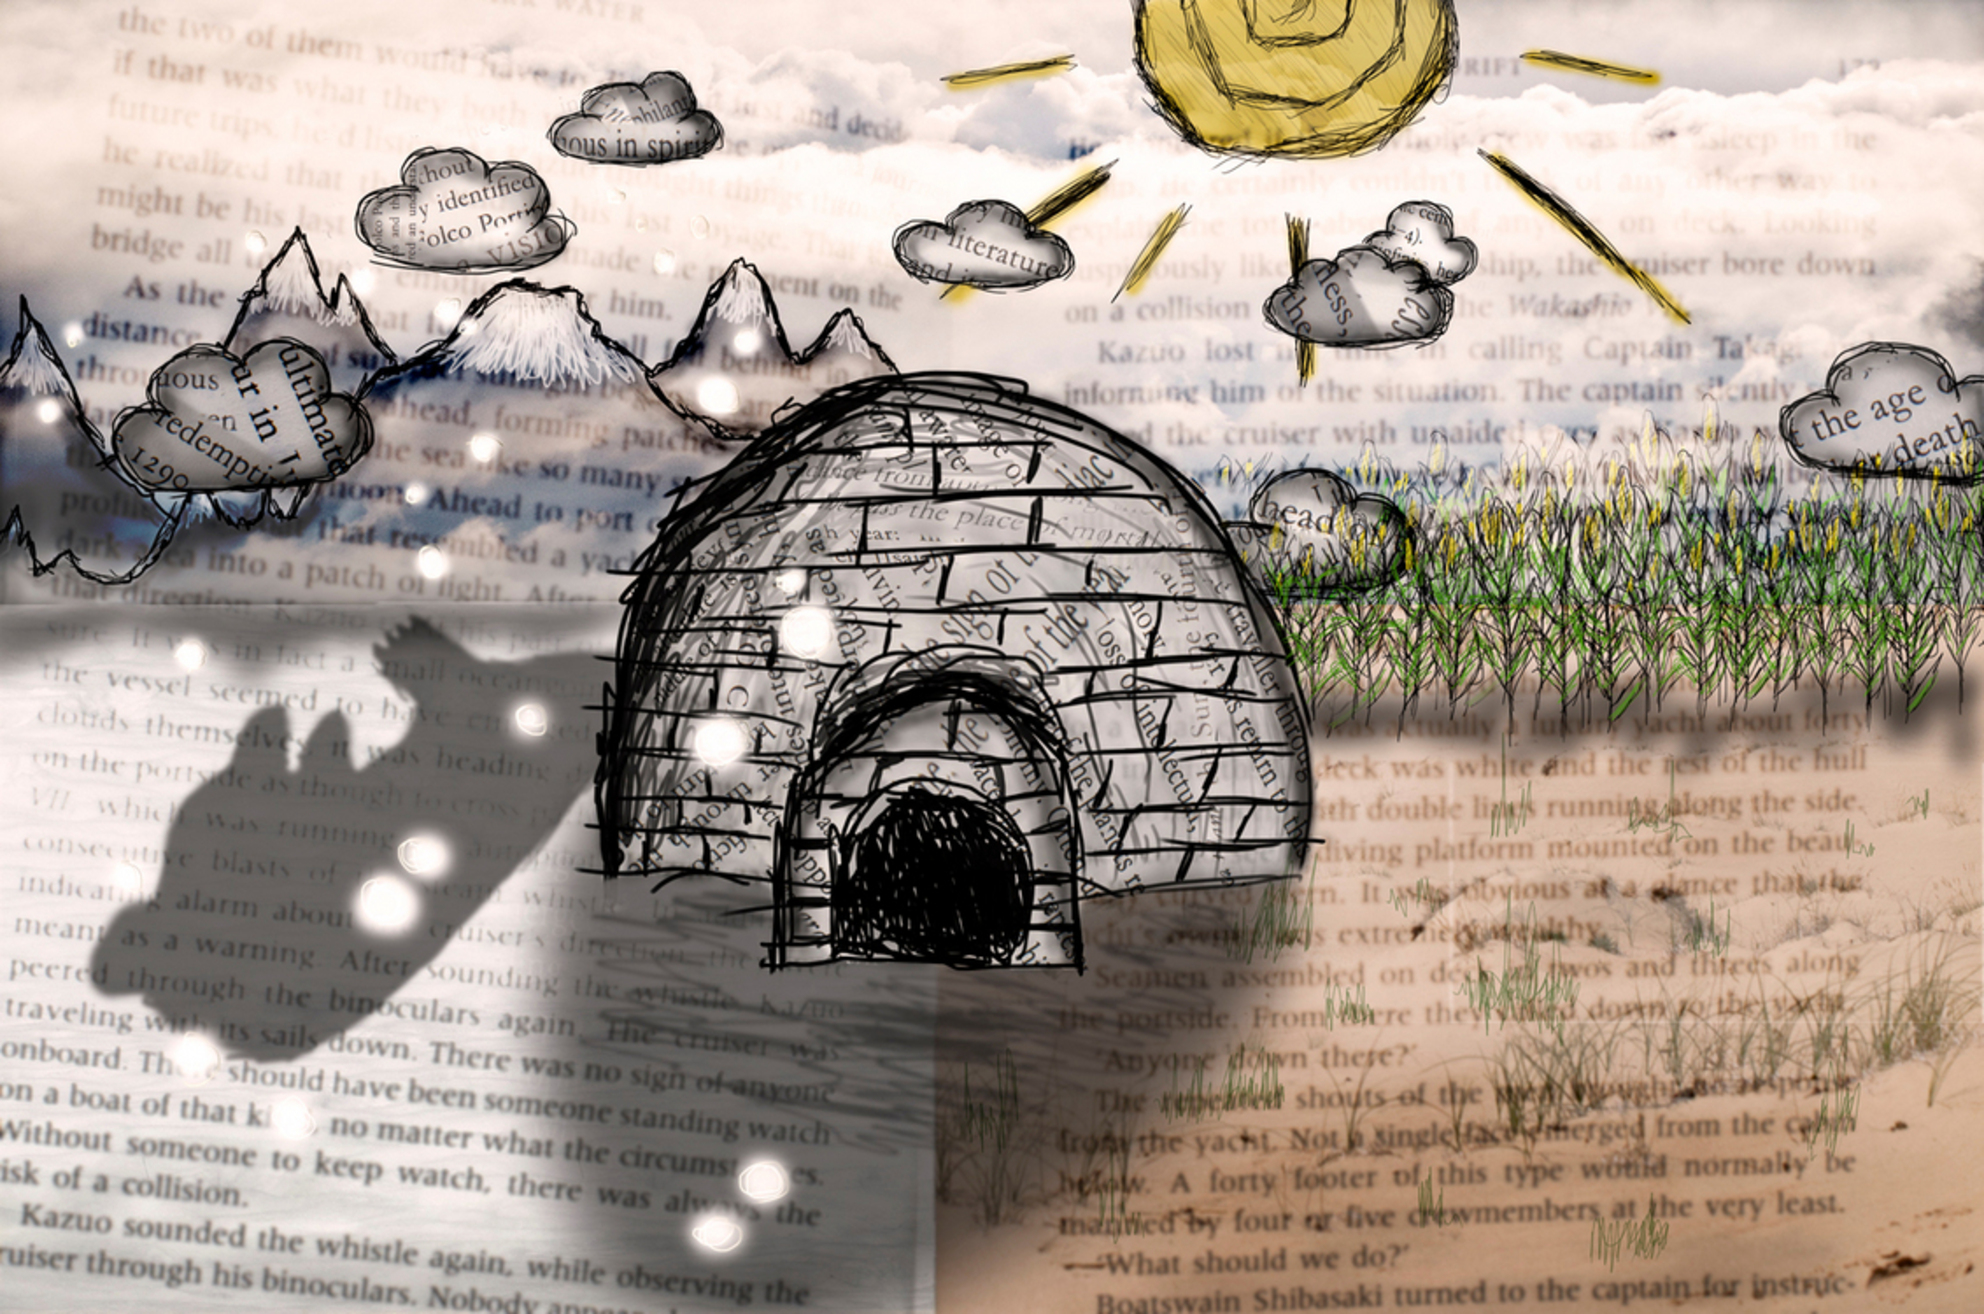 Iglo made of books - Neil Gaiman Calendar of tales Art - foto door truedee op 05-03-2013 - deze foto bevat: shadow, ice, sneeuw, winter, ijs, sun, art, letters, berg, son, rots, book, clouds, warm, summer, sky, snow, sunshine, sand, bear, sketch, words, field, juli, july, corn, pages, iglo, sneeuwvlok, cloud, grass, story, books, submission, contest, iceberg, icebear, snowflakes, neil, snowflake, draw, Gaiman, flake, sentence - Deze foto mag gebruikt worden in een Zoom.nl publicatie